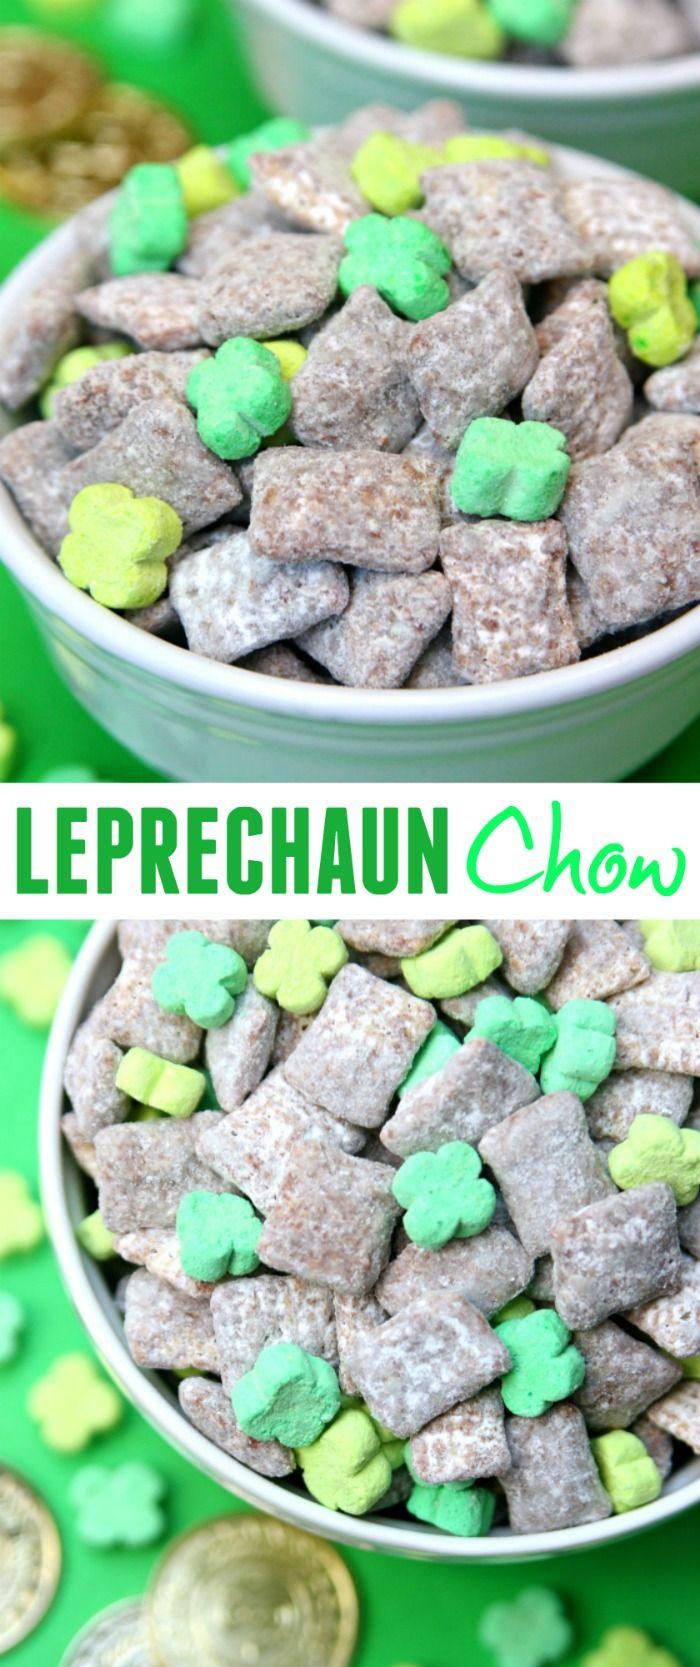 Leprechaun Chow